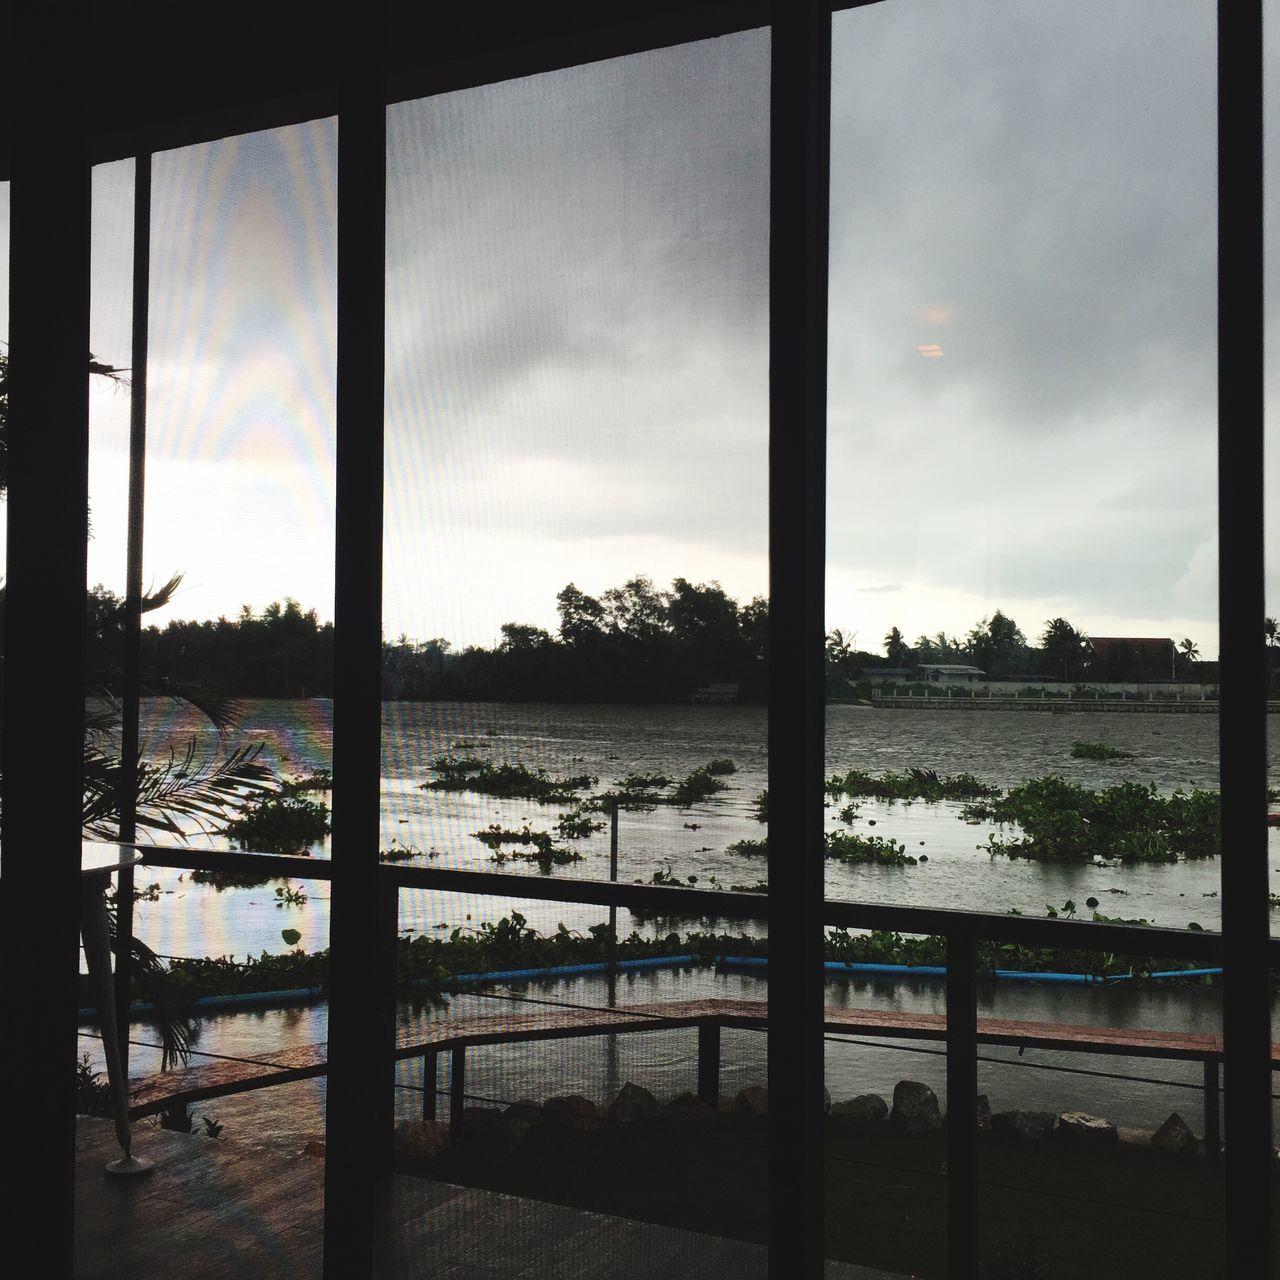 Rainy See View River Samutsongkram Thailand Thegrace Resort